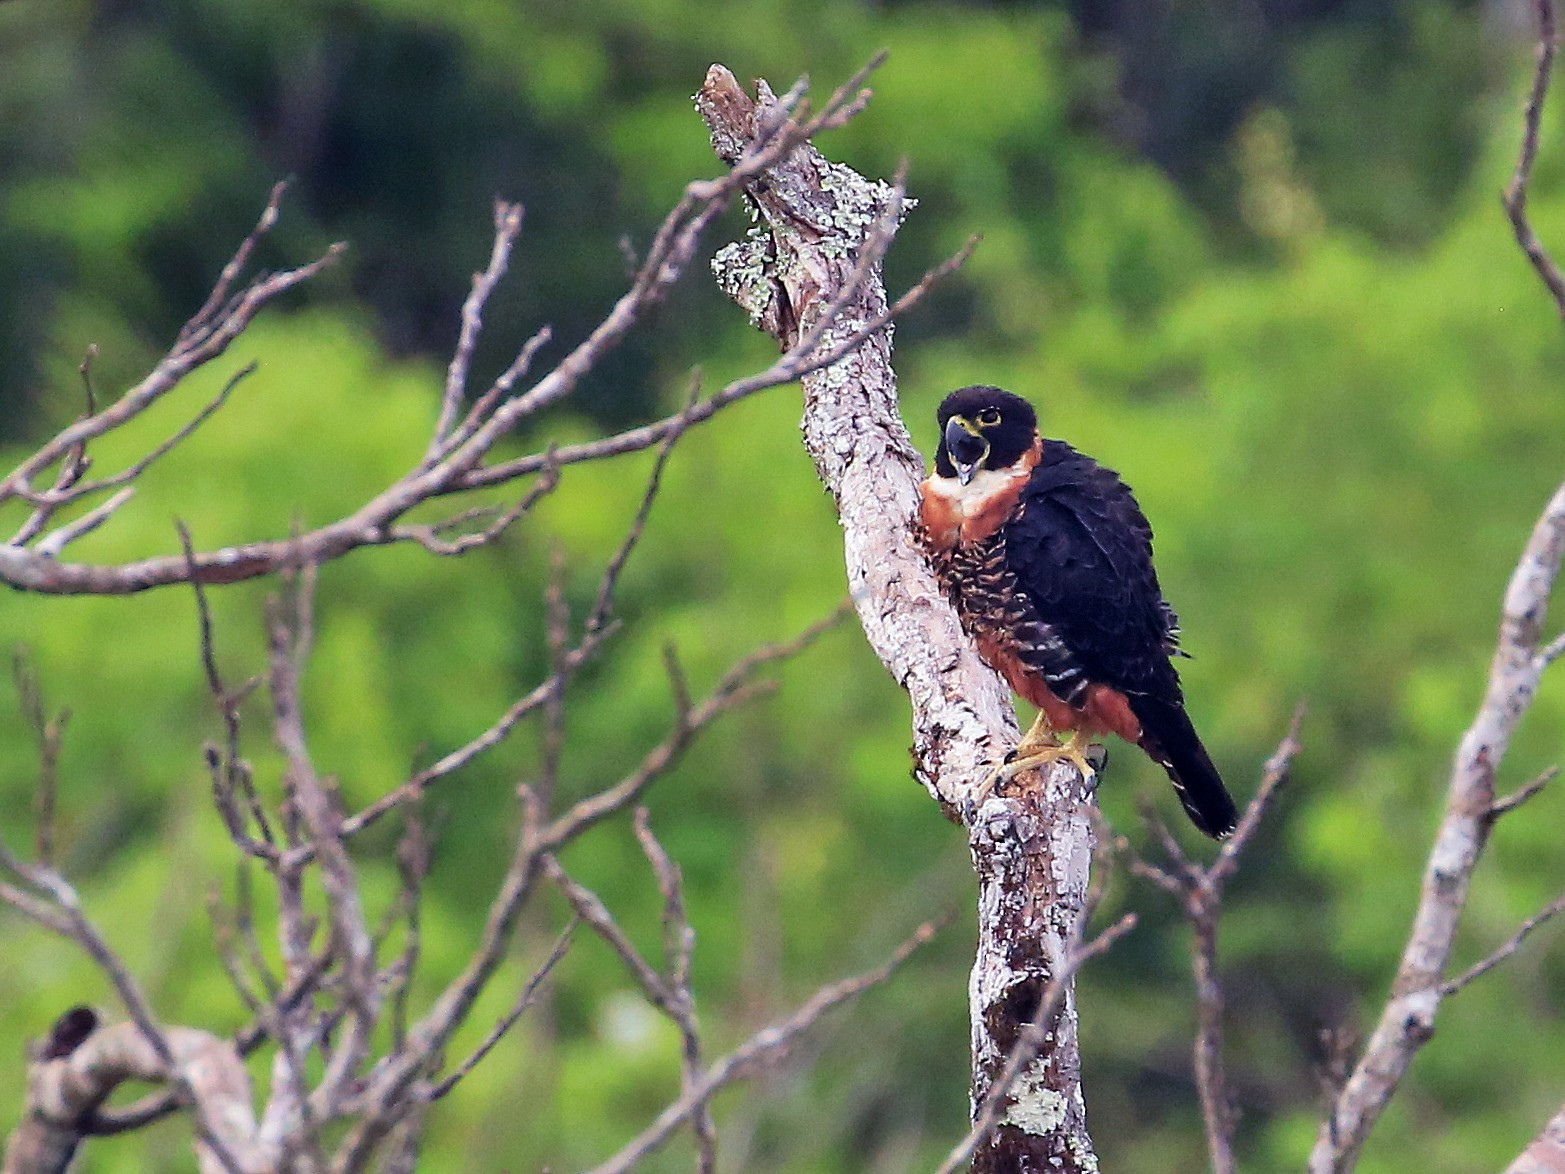 Orange-breasted Falcon - Tim Lenz